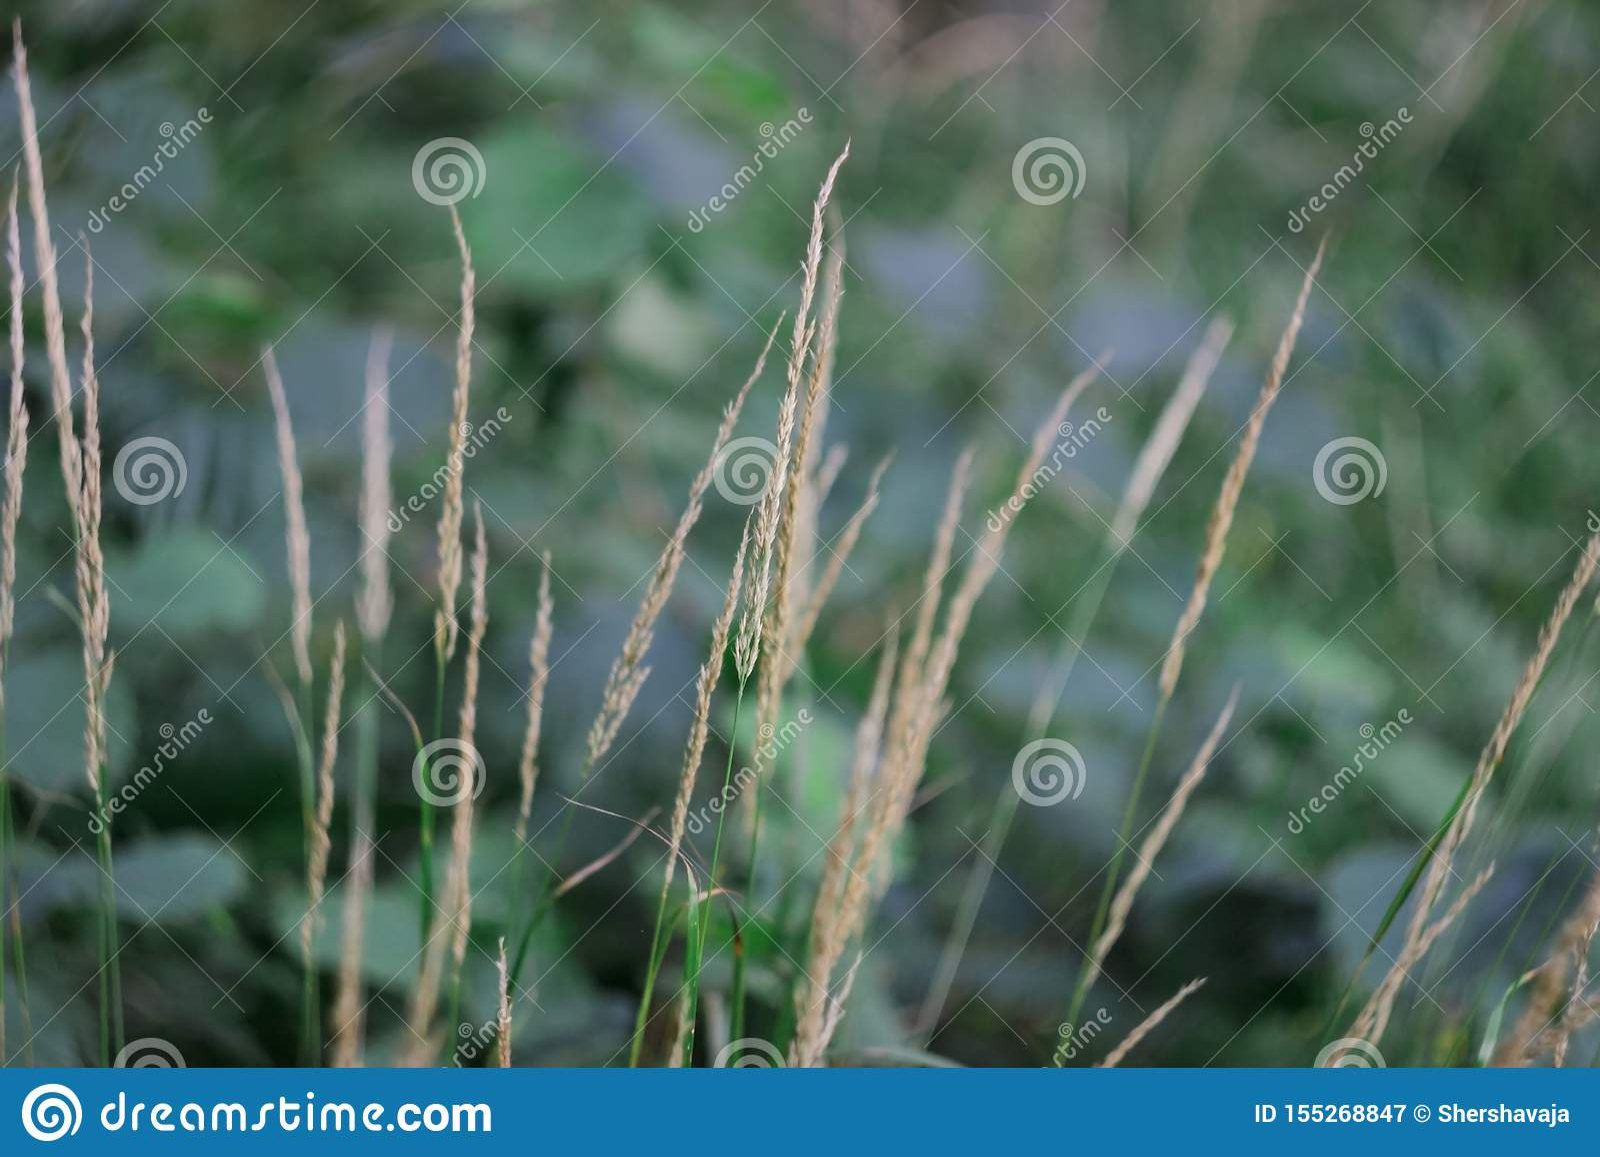 Tall grass in a dark forest.